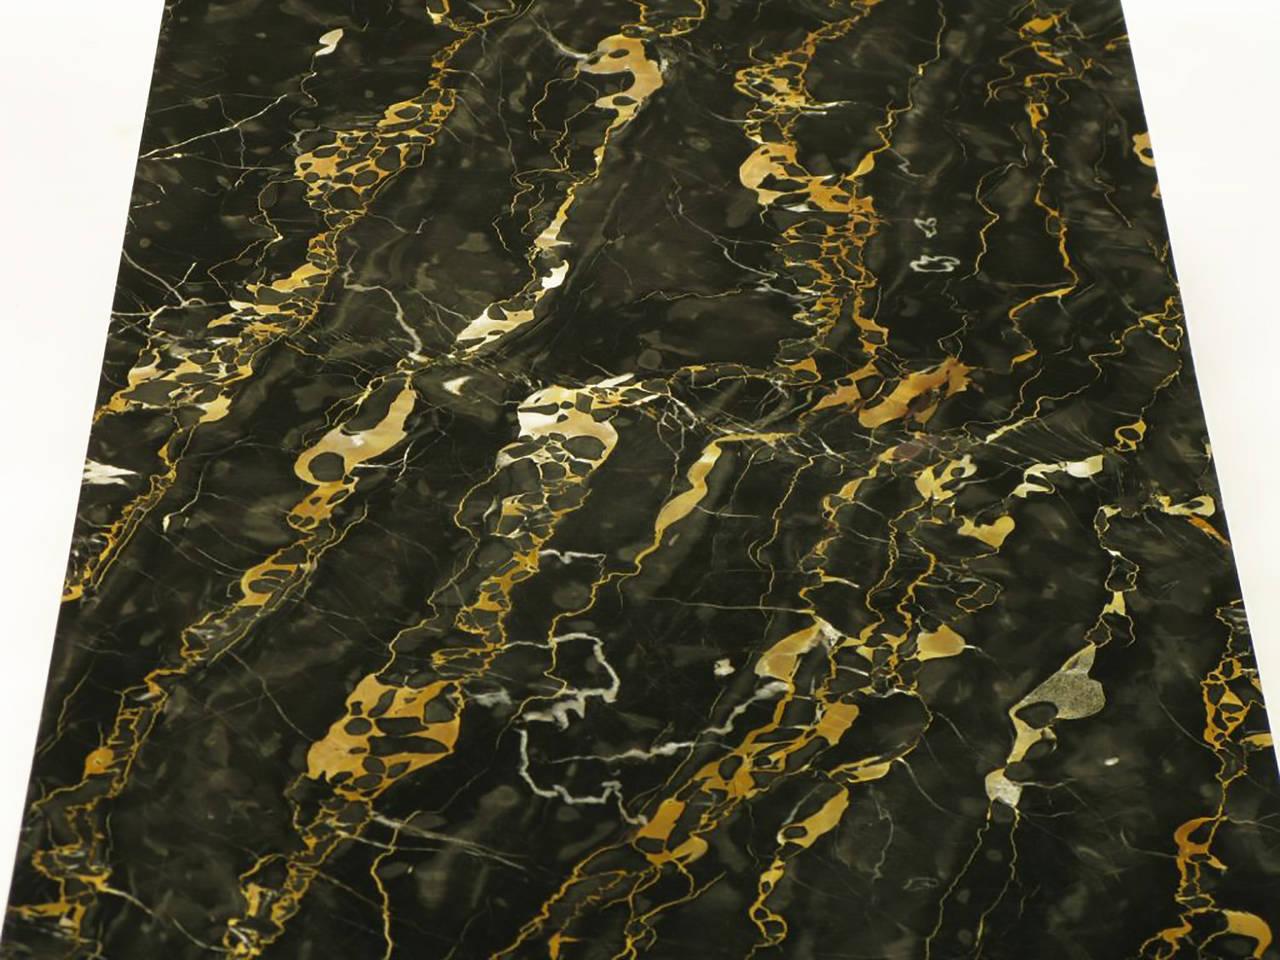 Custom Italian Portoro Marble and Brass Coffee Table For Sale 3